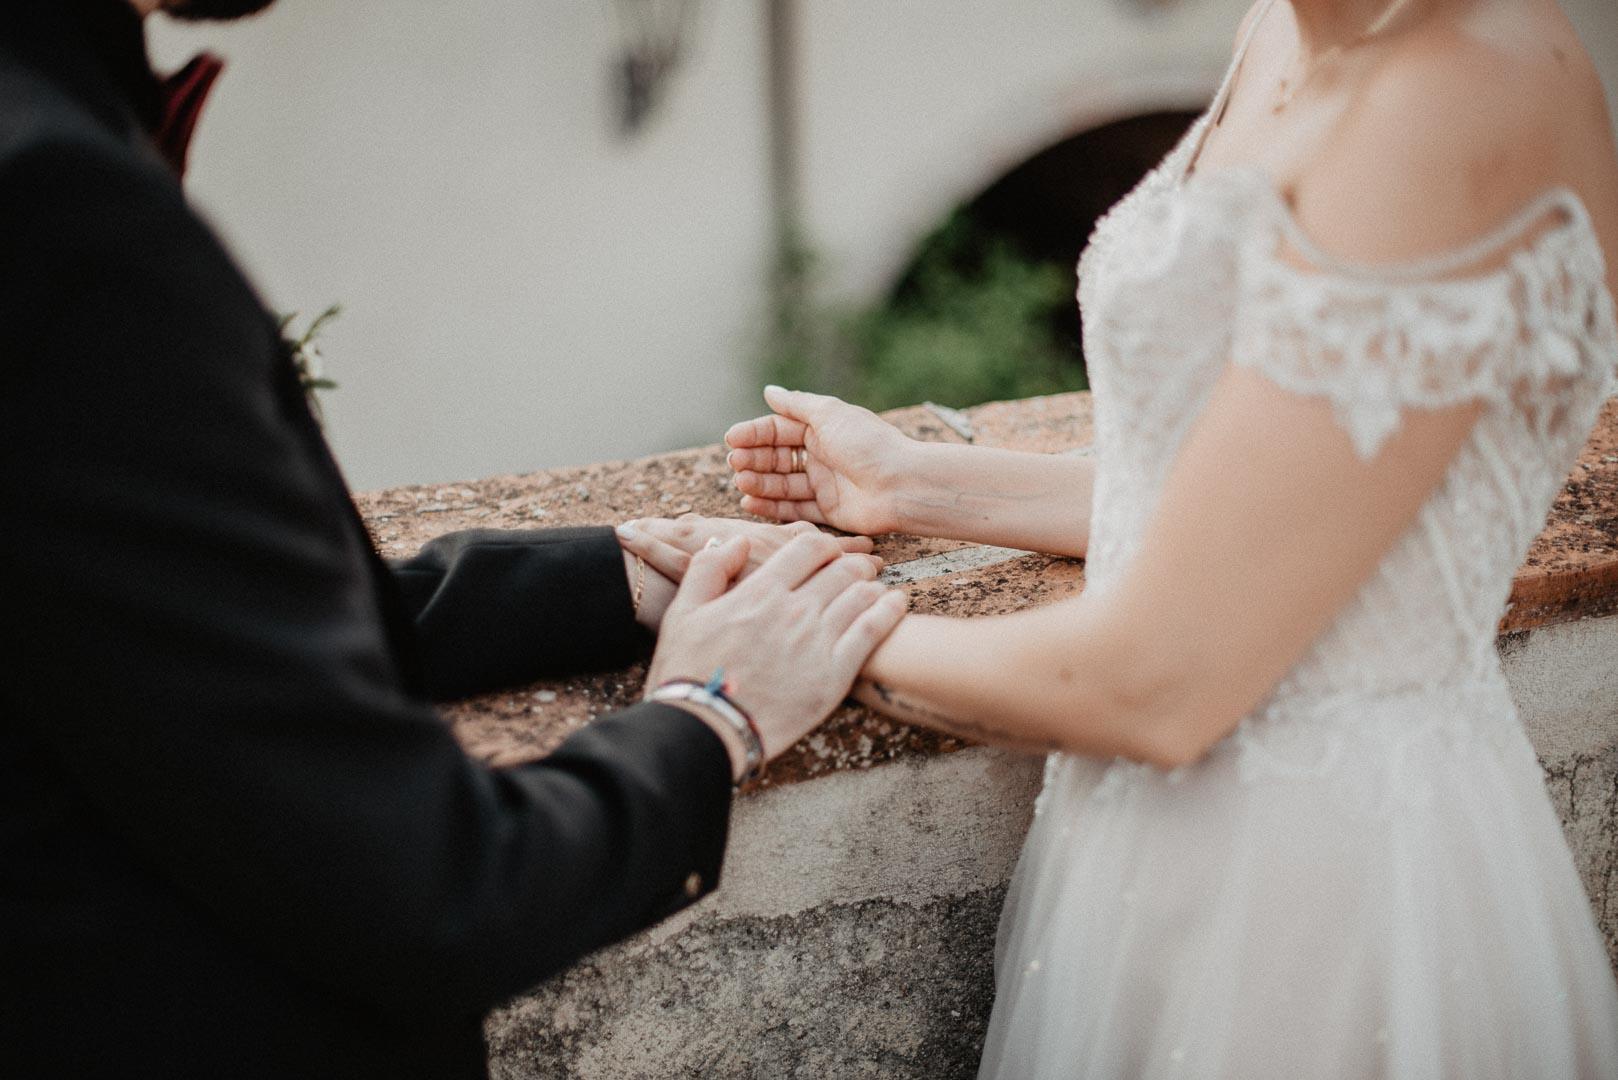 wedding-photographer-destination-fineart-bespoke-reportage-tuscany-villascorzi-vivianeizzo-spazio46-124